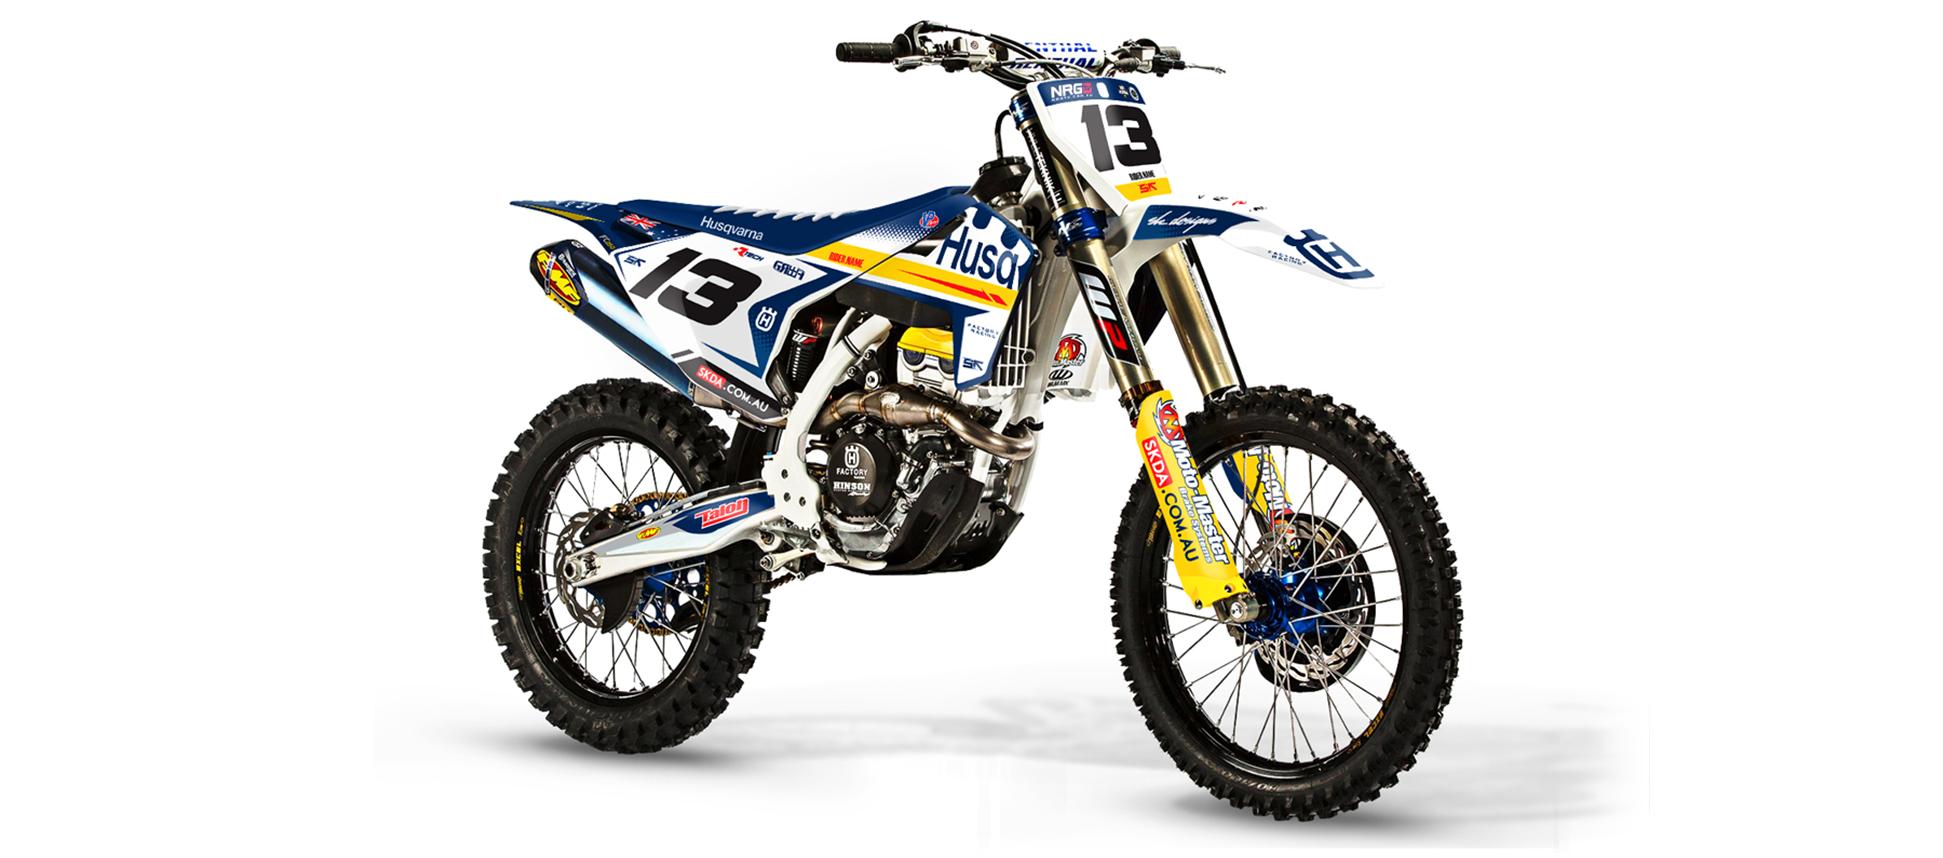 Yamaha bike sticker designs - Sk Designs Australia Custom Moto Graphics Seat Covers Accessories